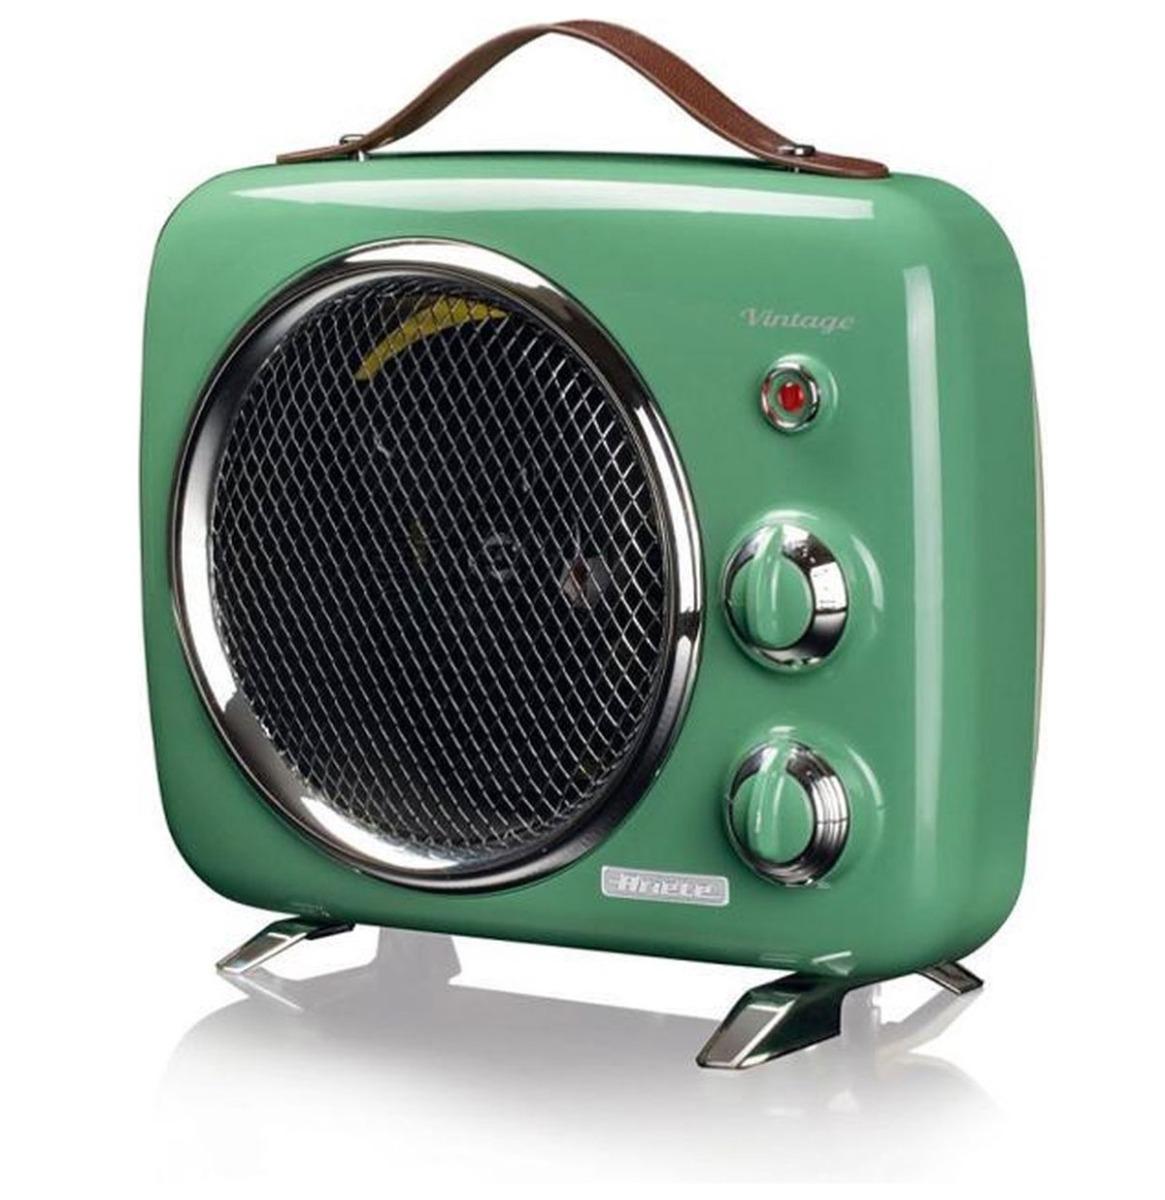 Ariete Vintage Draagbare Mini Heater en Ventilator - Groen